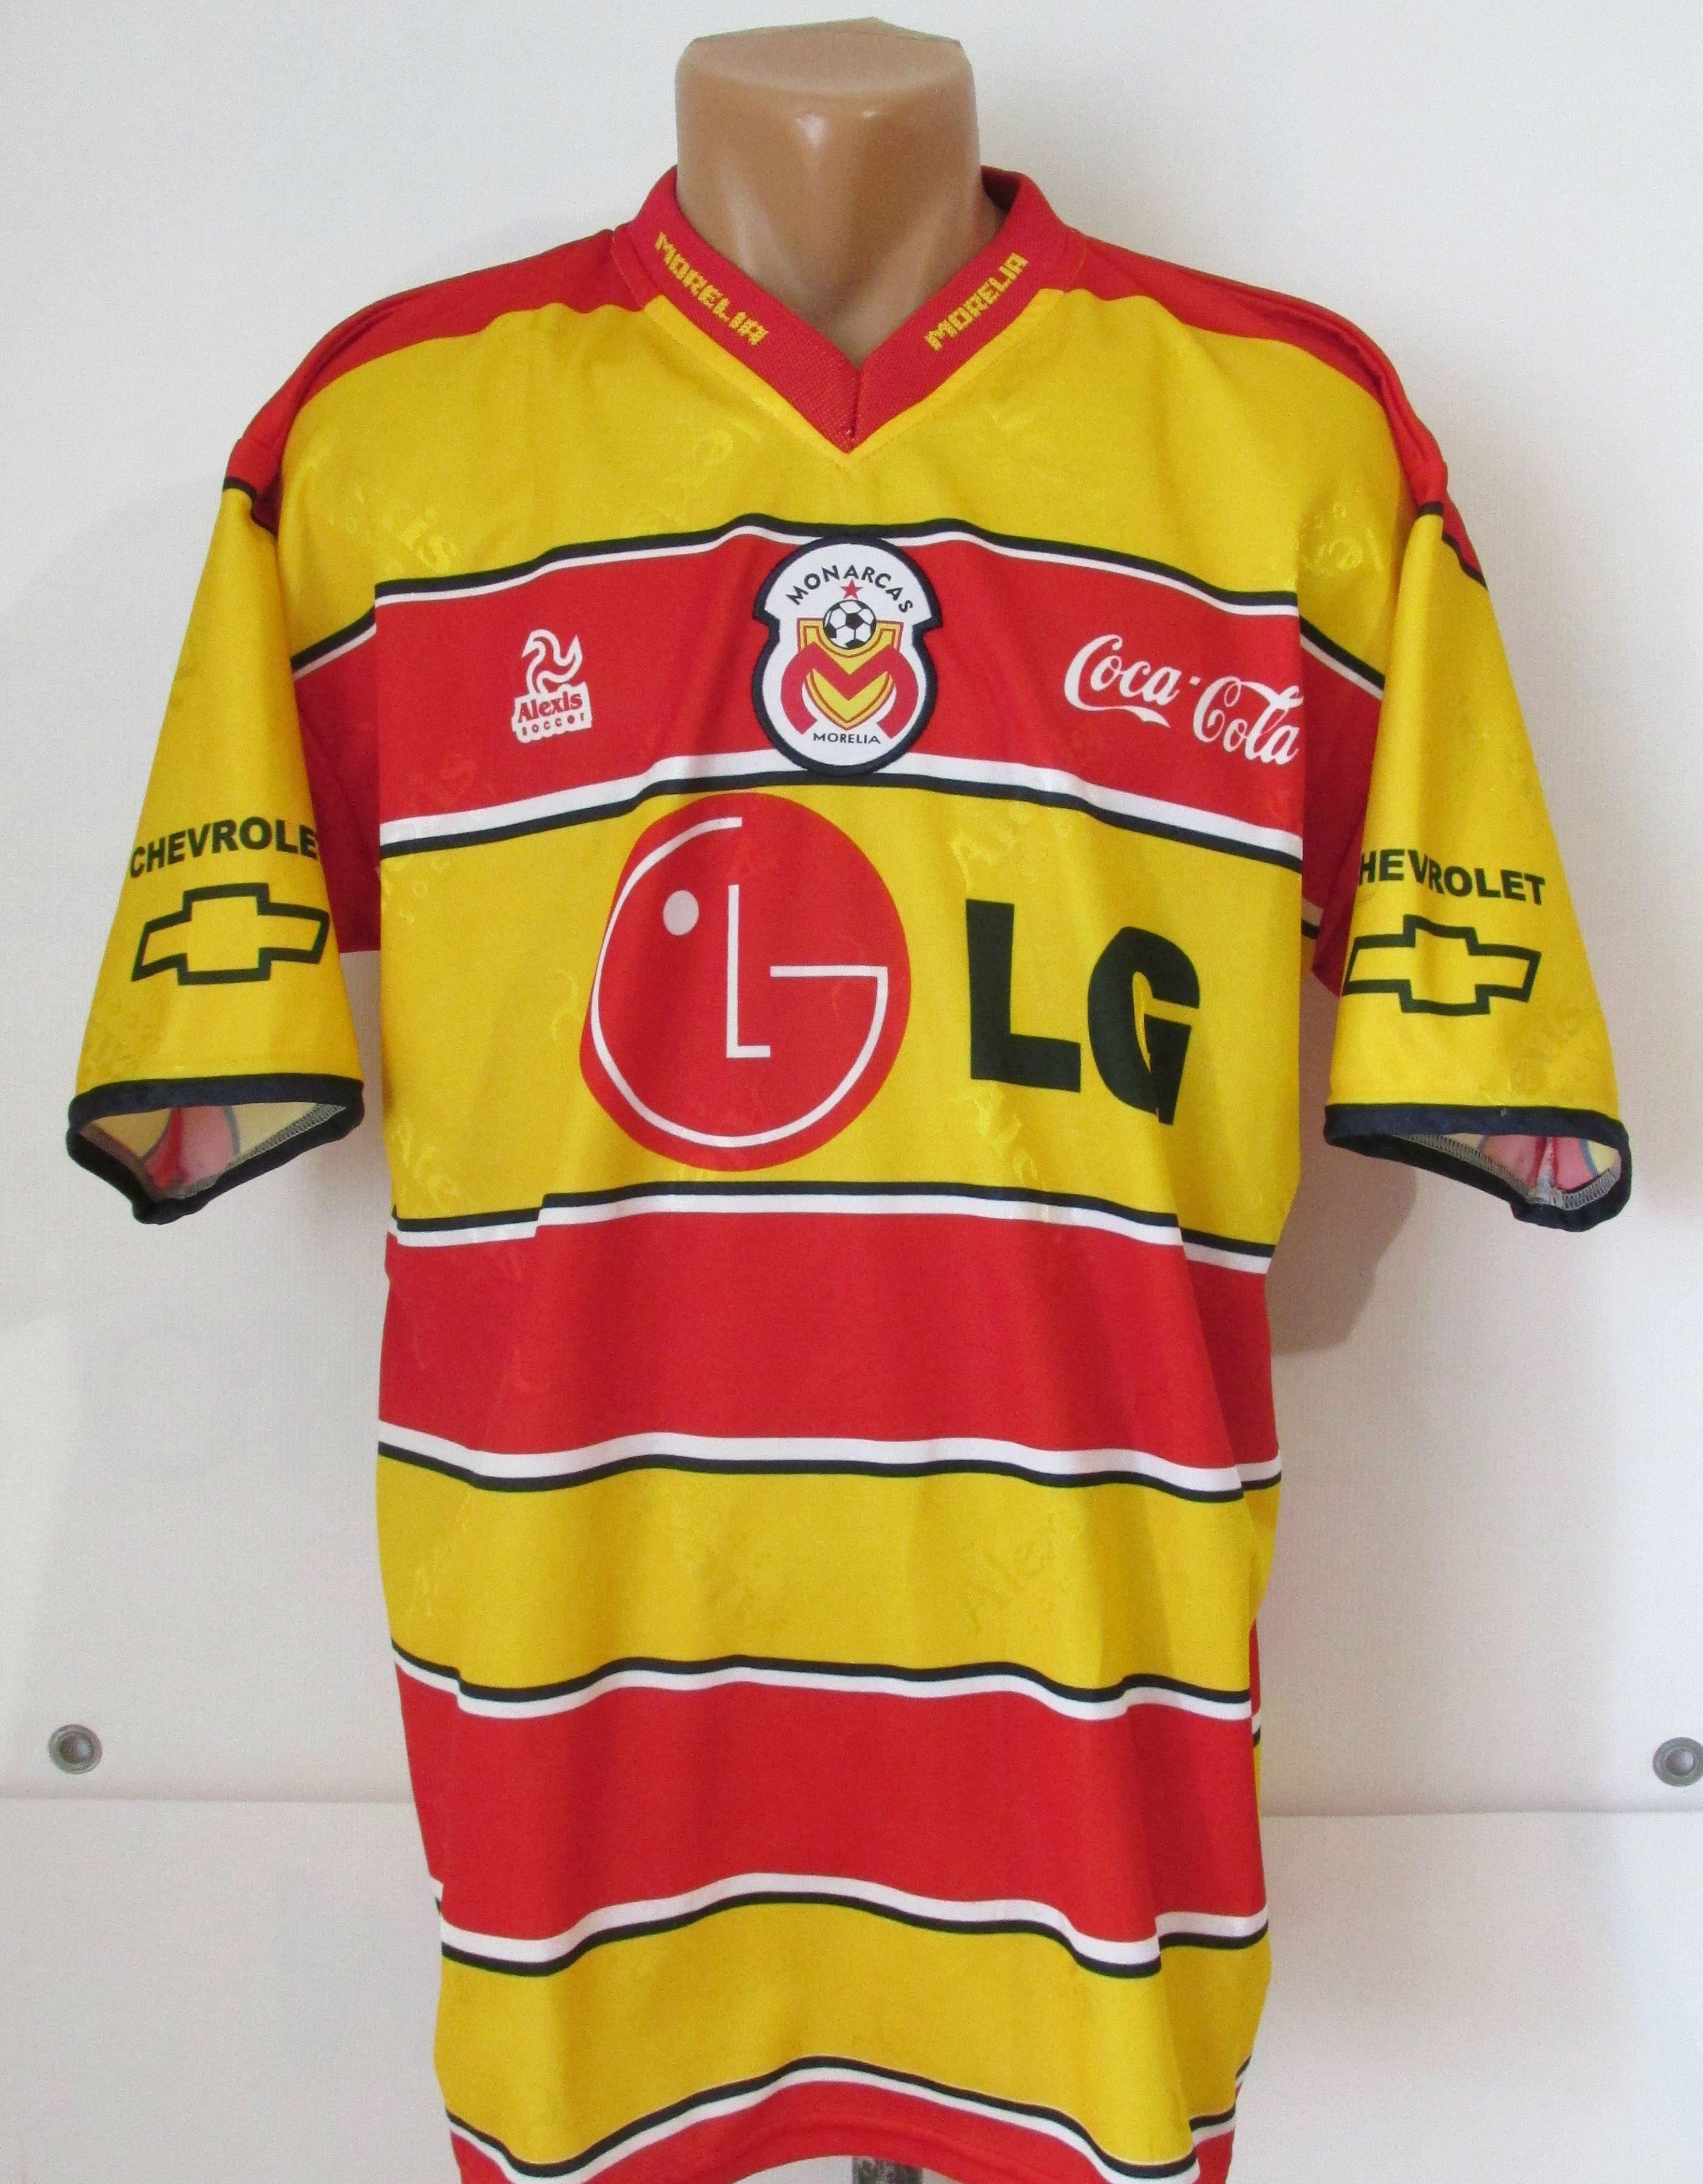 ac9be744c Monarcas Morelia 2003 home football shirt by Alexis Soccer Mexico Mexica  morelia jersey  Monarcas  jersey  soccer  football  cocacola  morelia